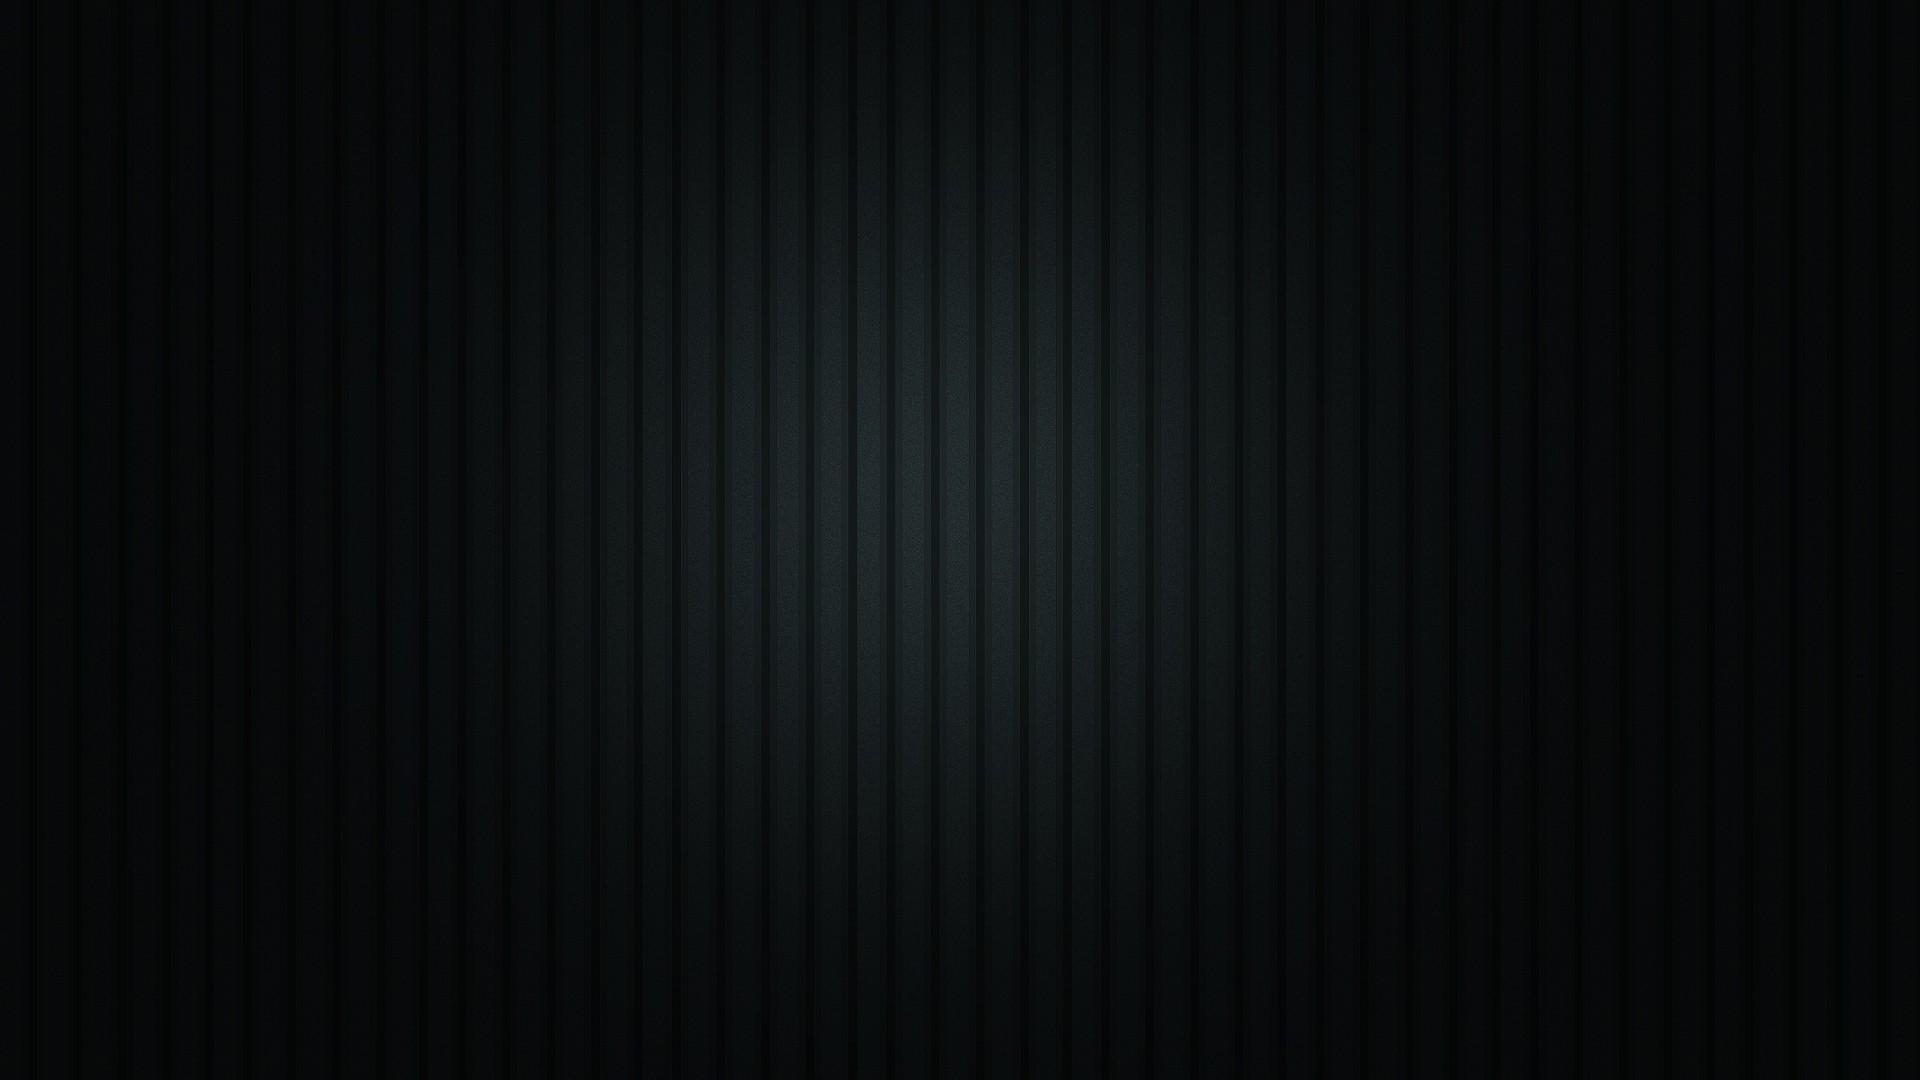 Black Wallpaper HD 1080p (67+ images)